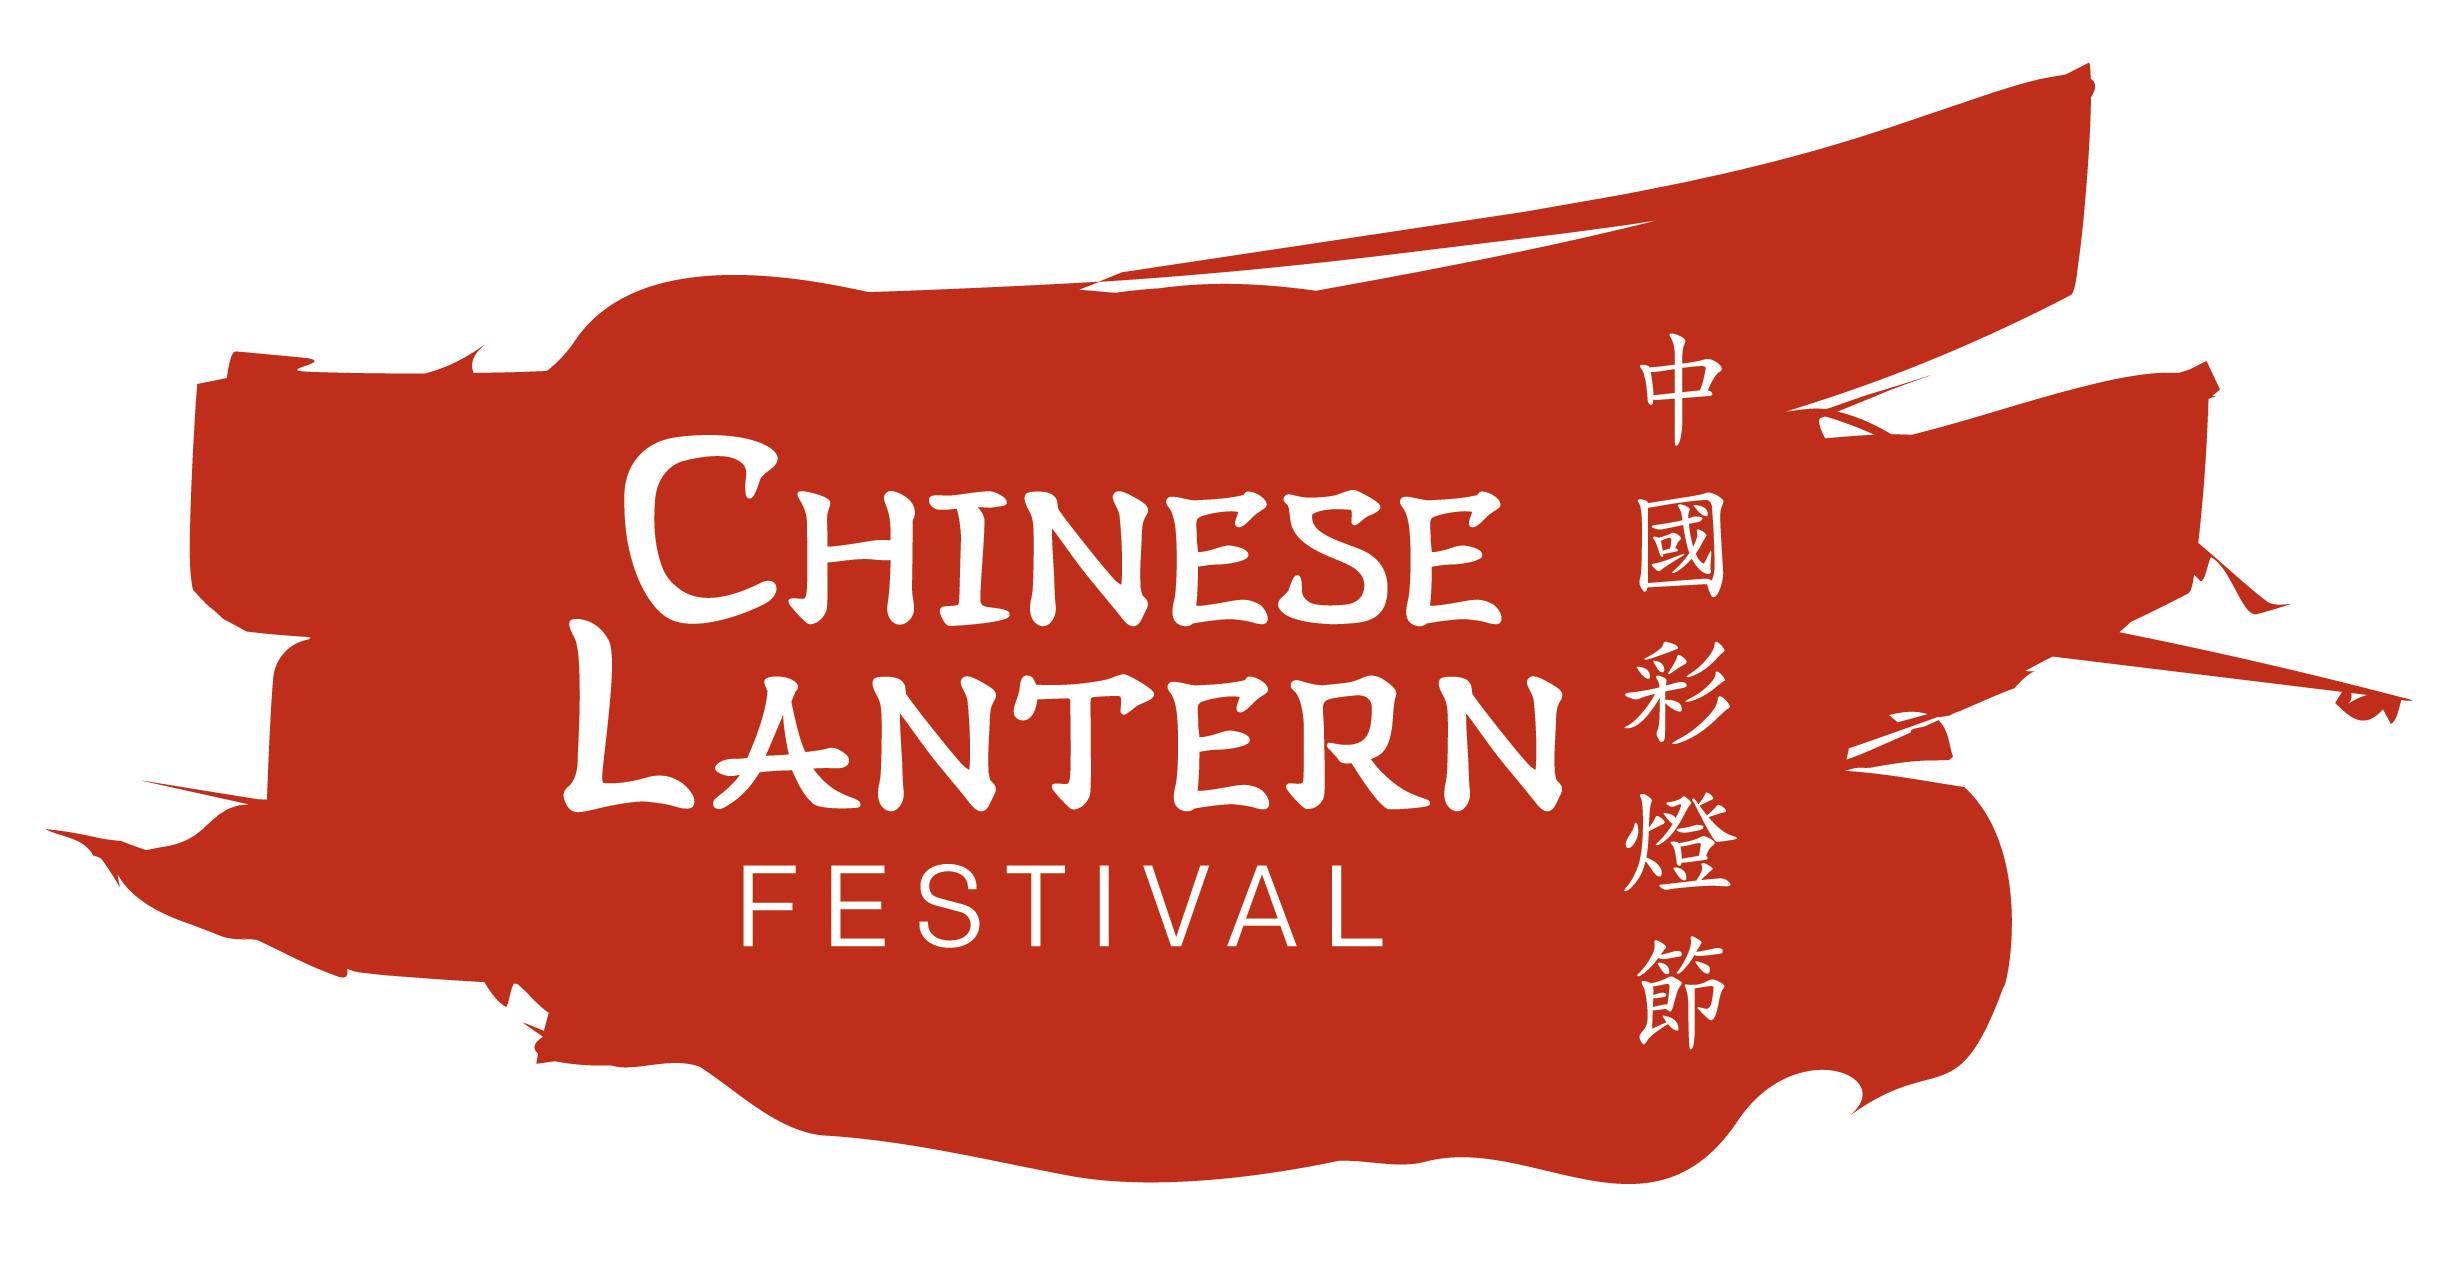 China clipart lantern festival Lantern Festival Chinese Download Lantern